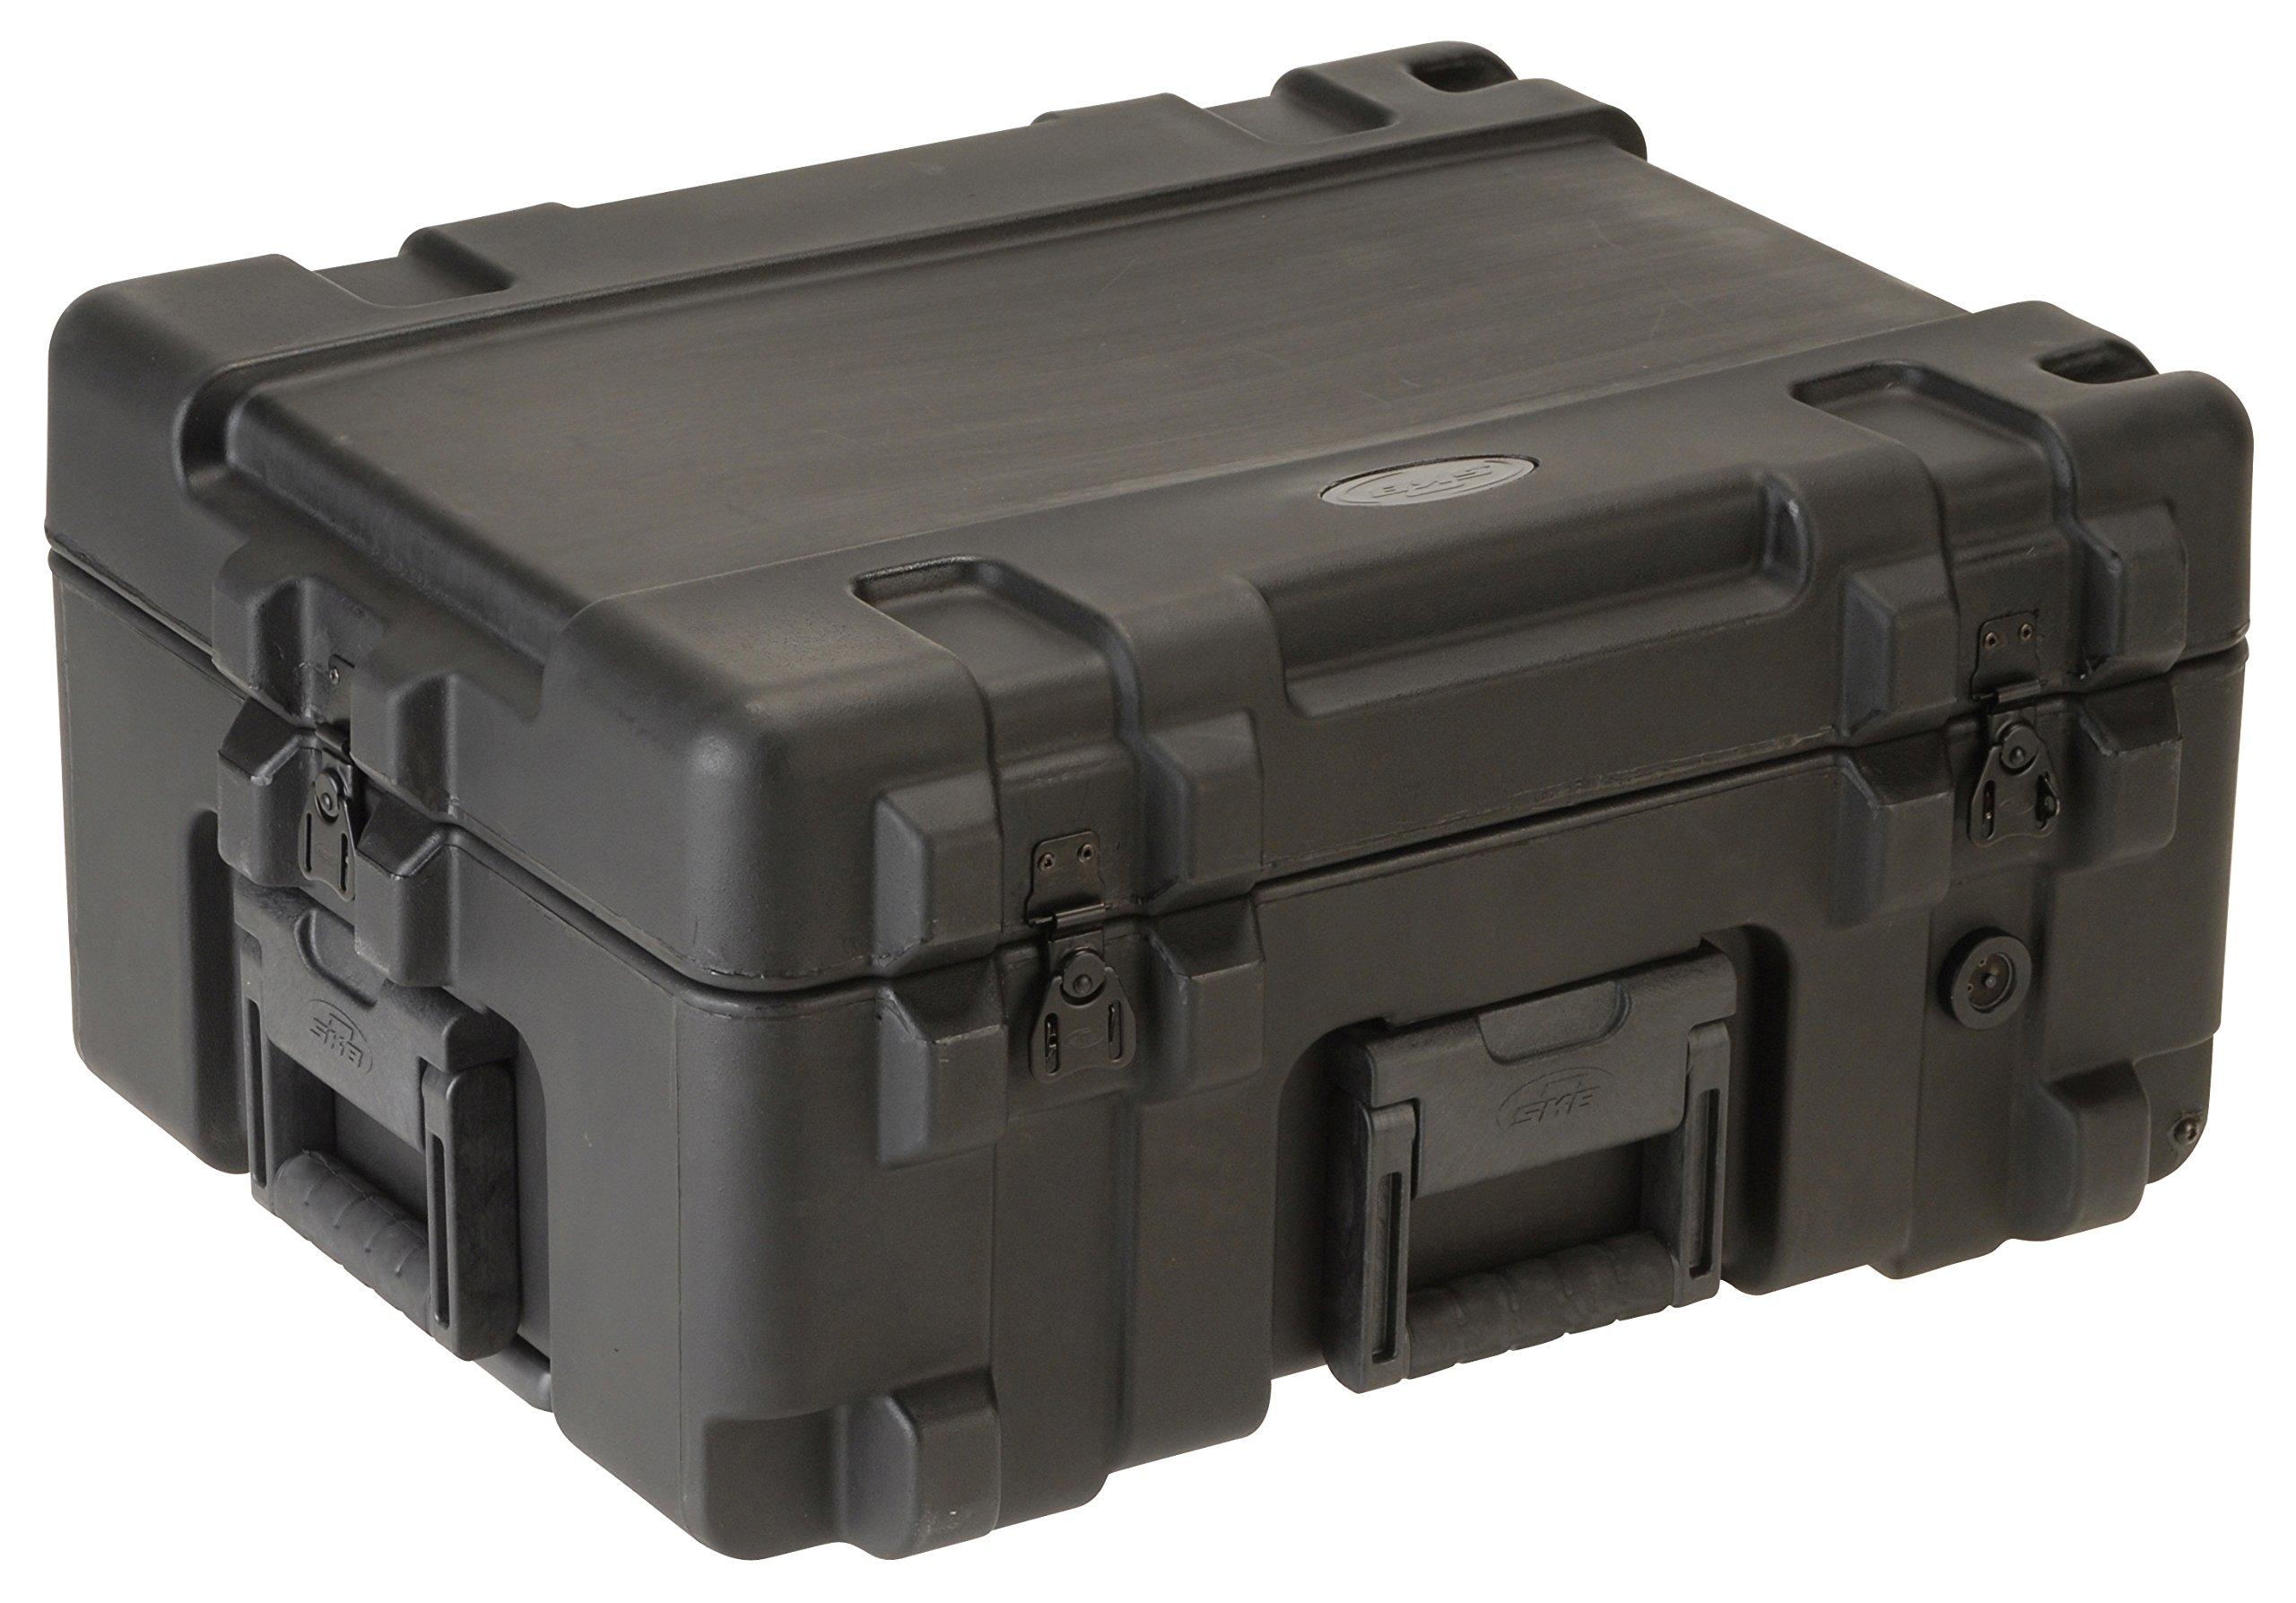 SKB Equipment Case 22'' X 17'' X 10 1/2'' - Foam & Wheels